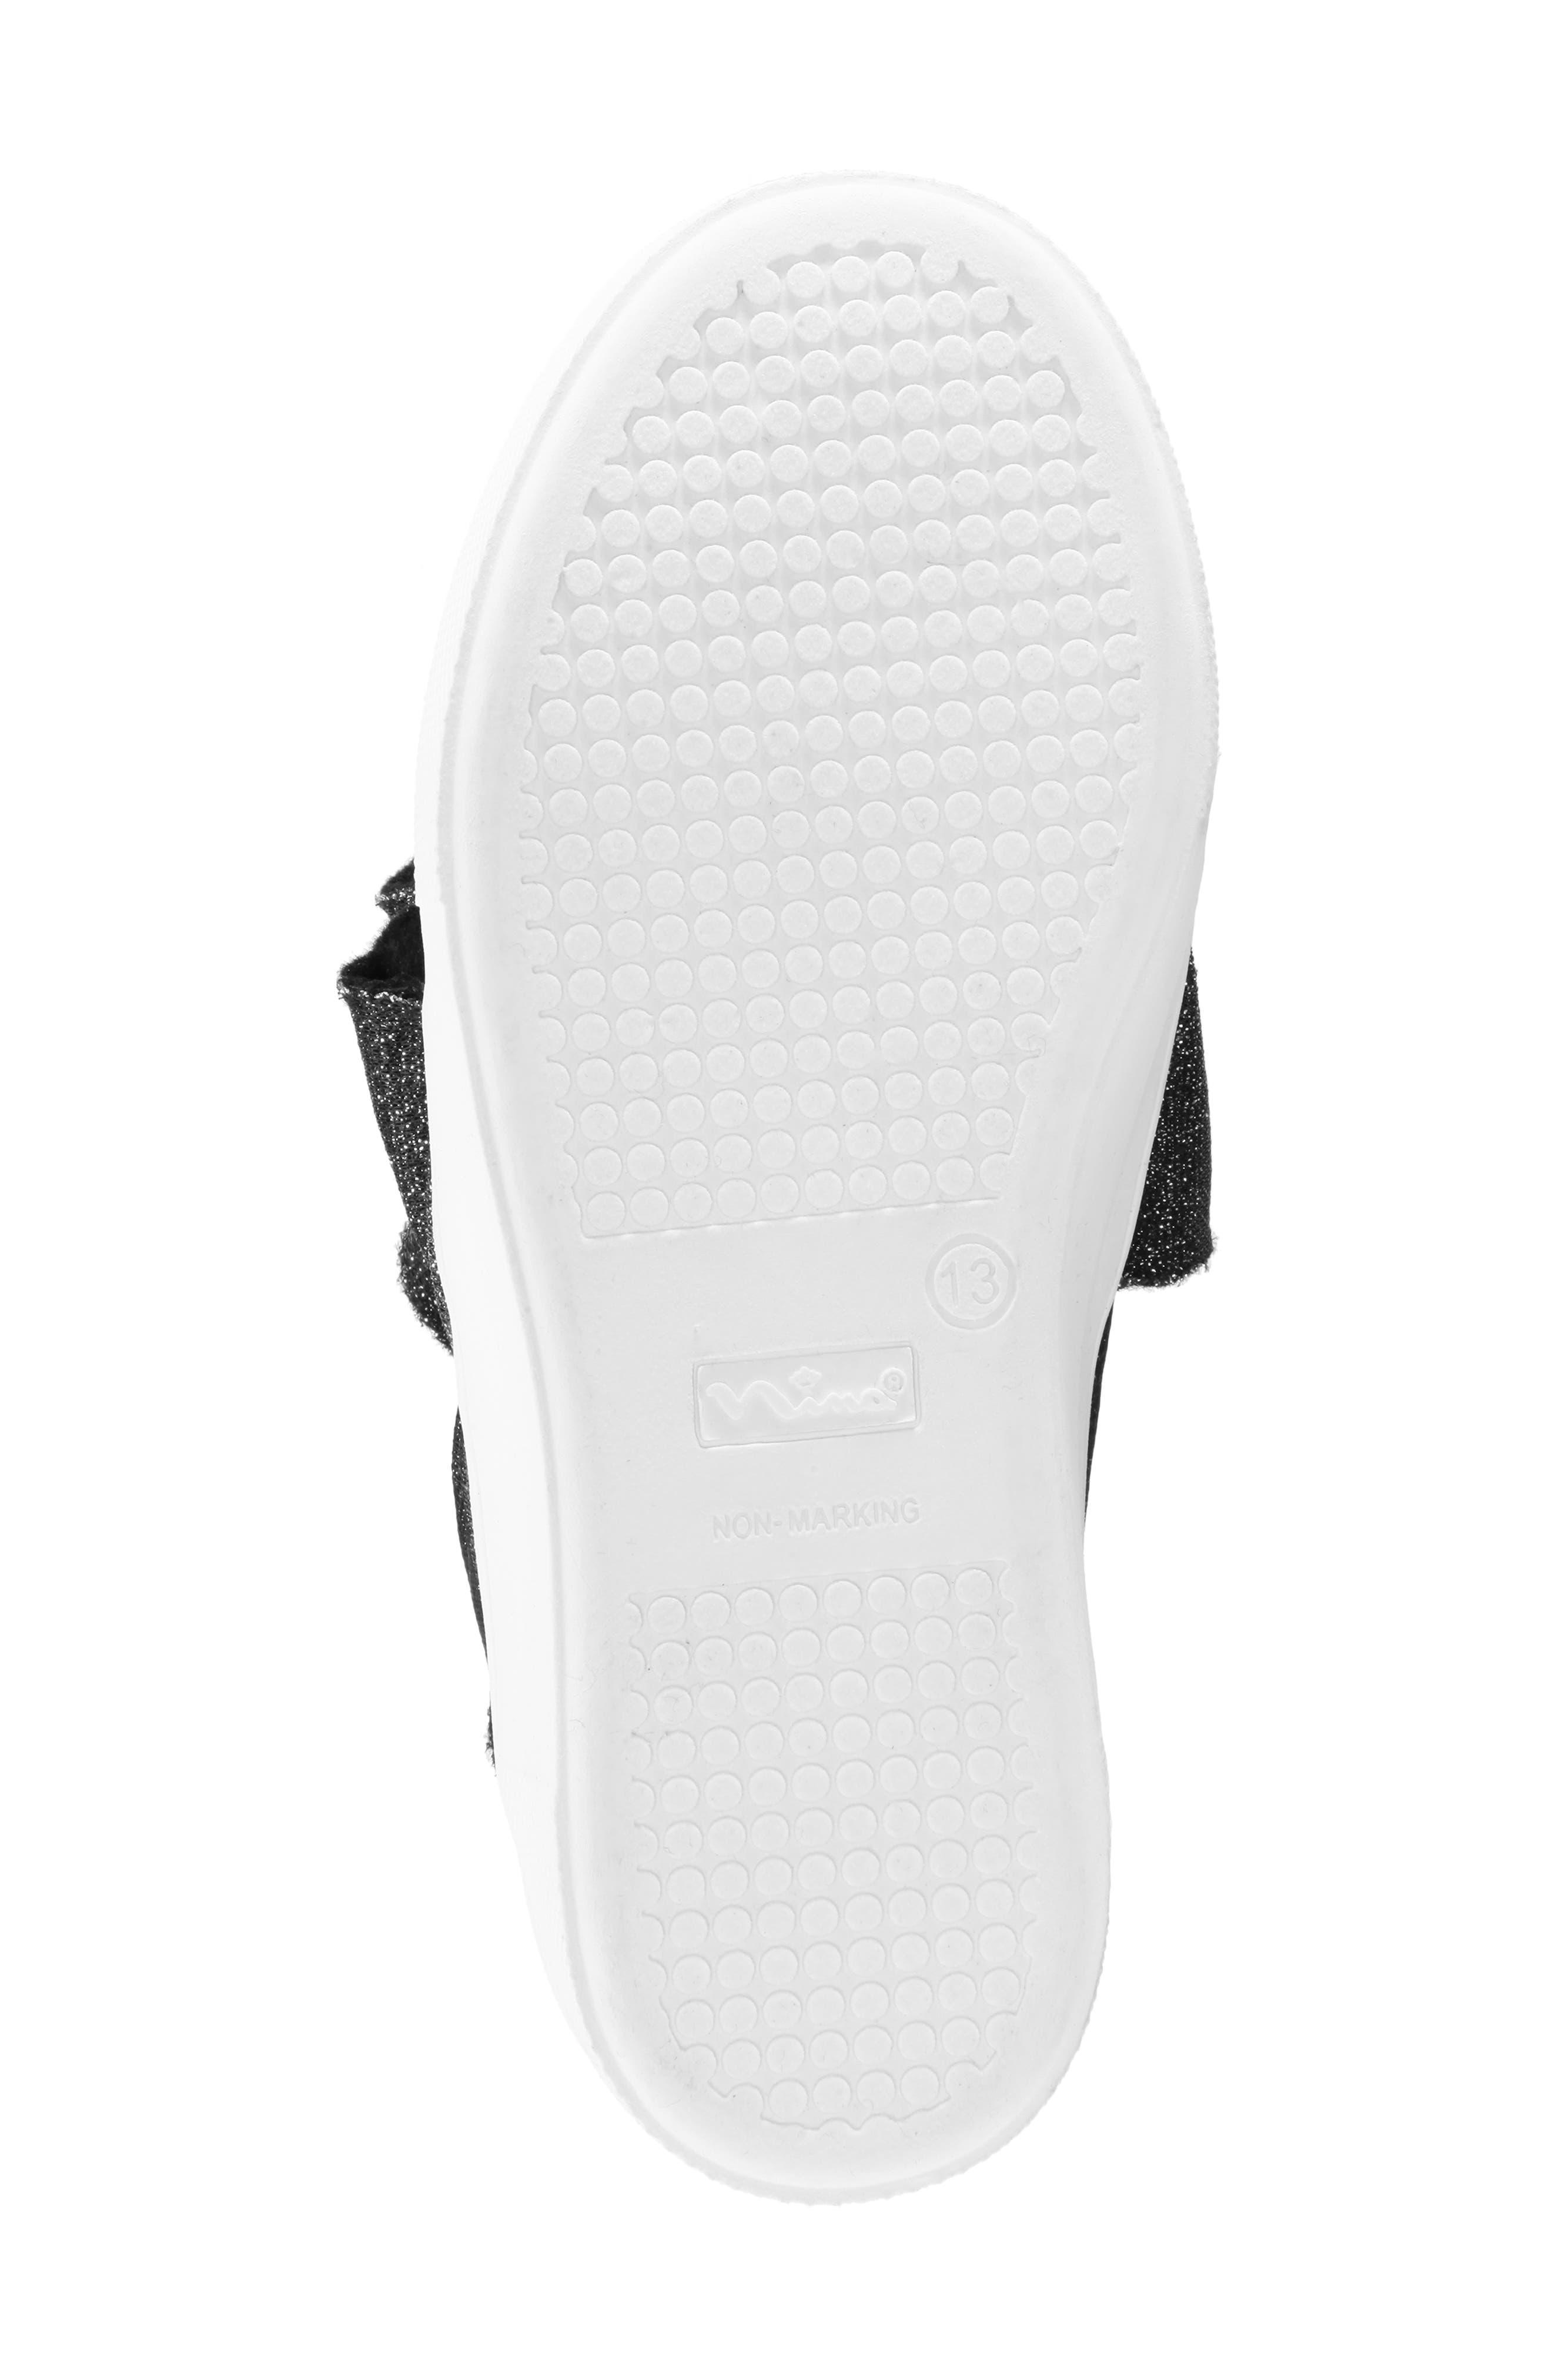 Ivani Slip-On Sneaker,                             Alternate thumbnail 6, color,                             BLACK SPARKLE FABRIC